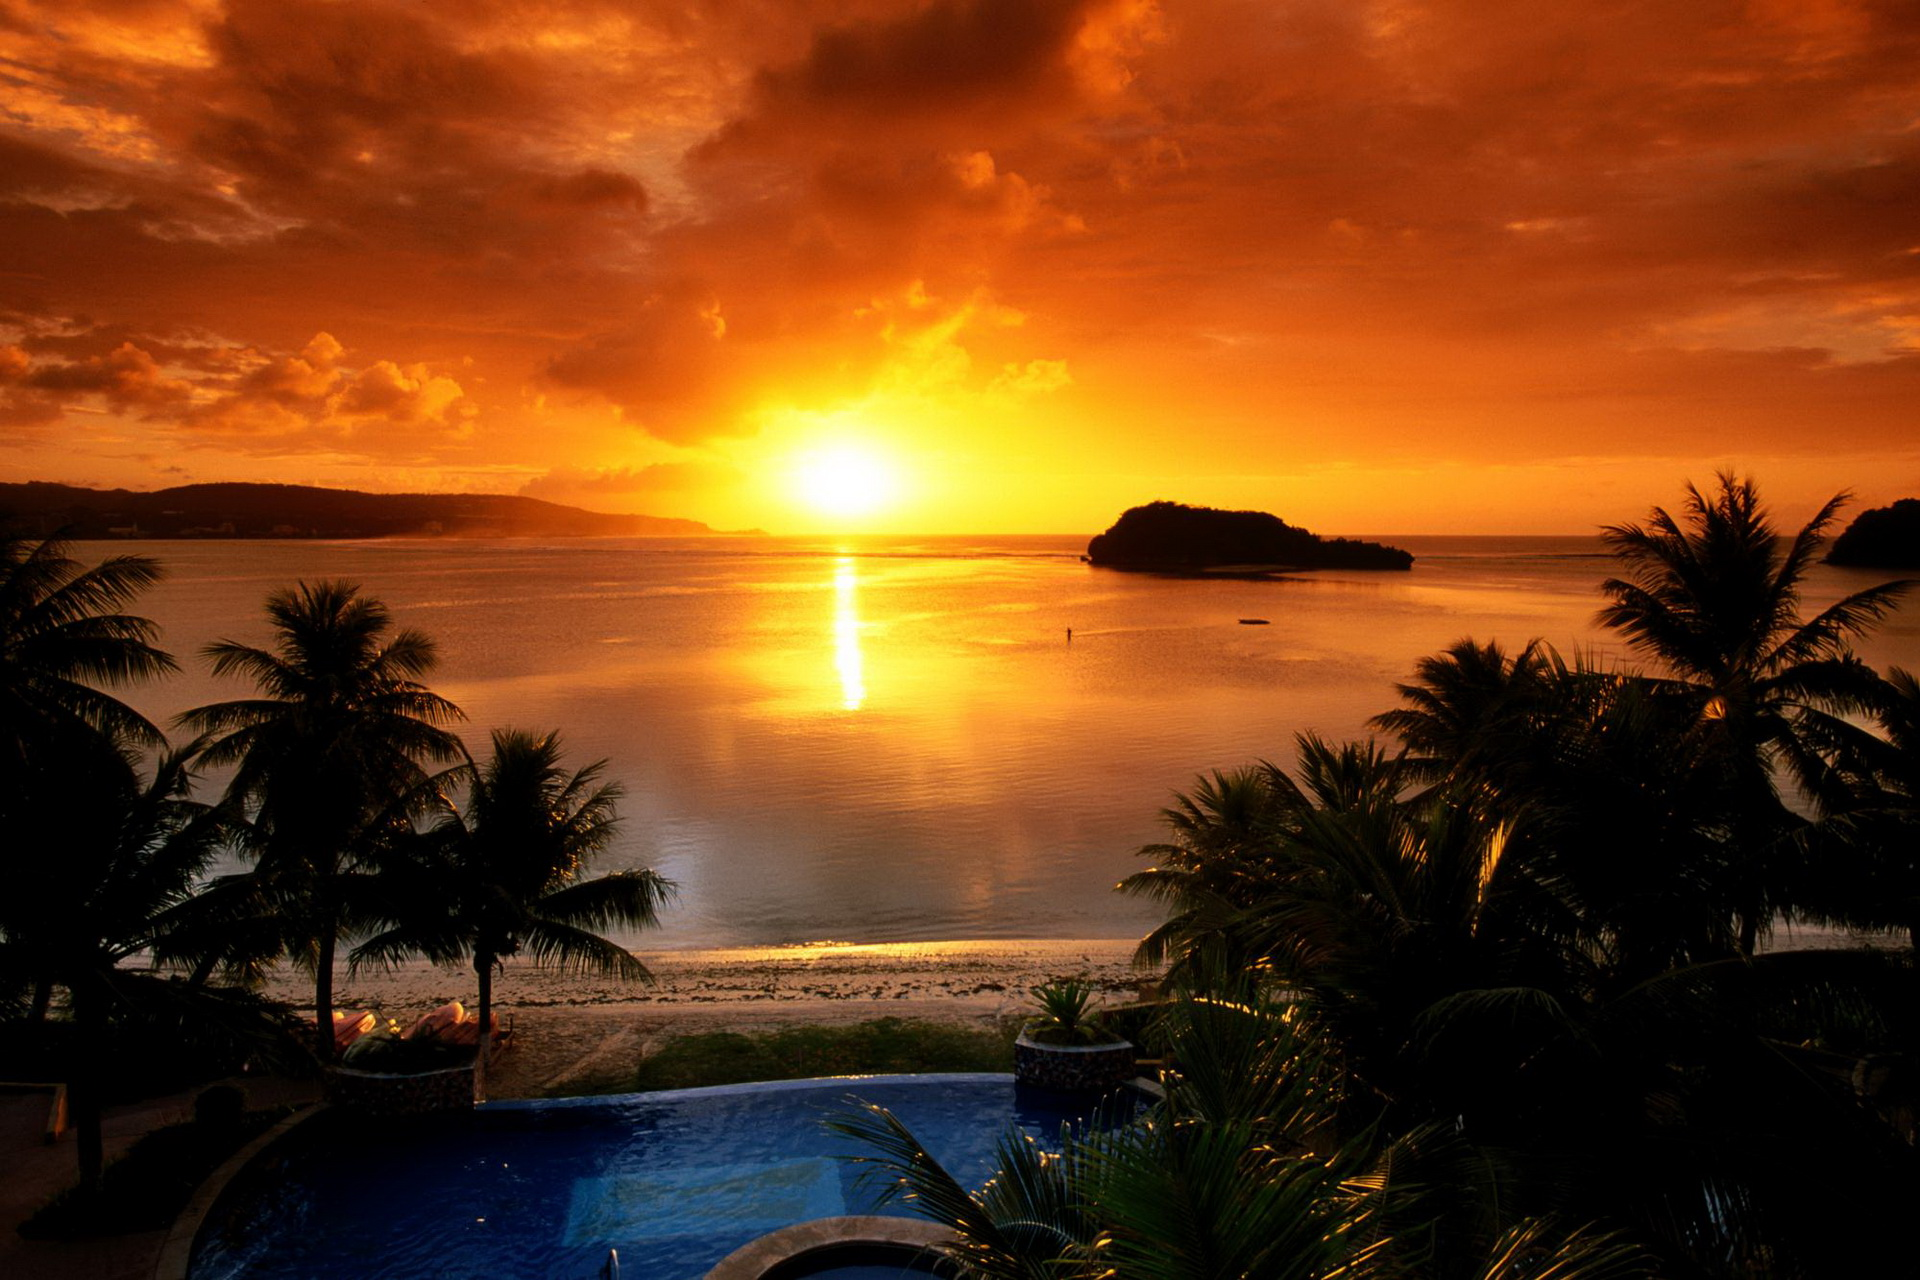 Natural Sunset at Lake Desktop Backgrounds 1920x1280